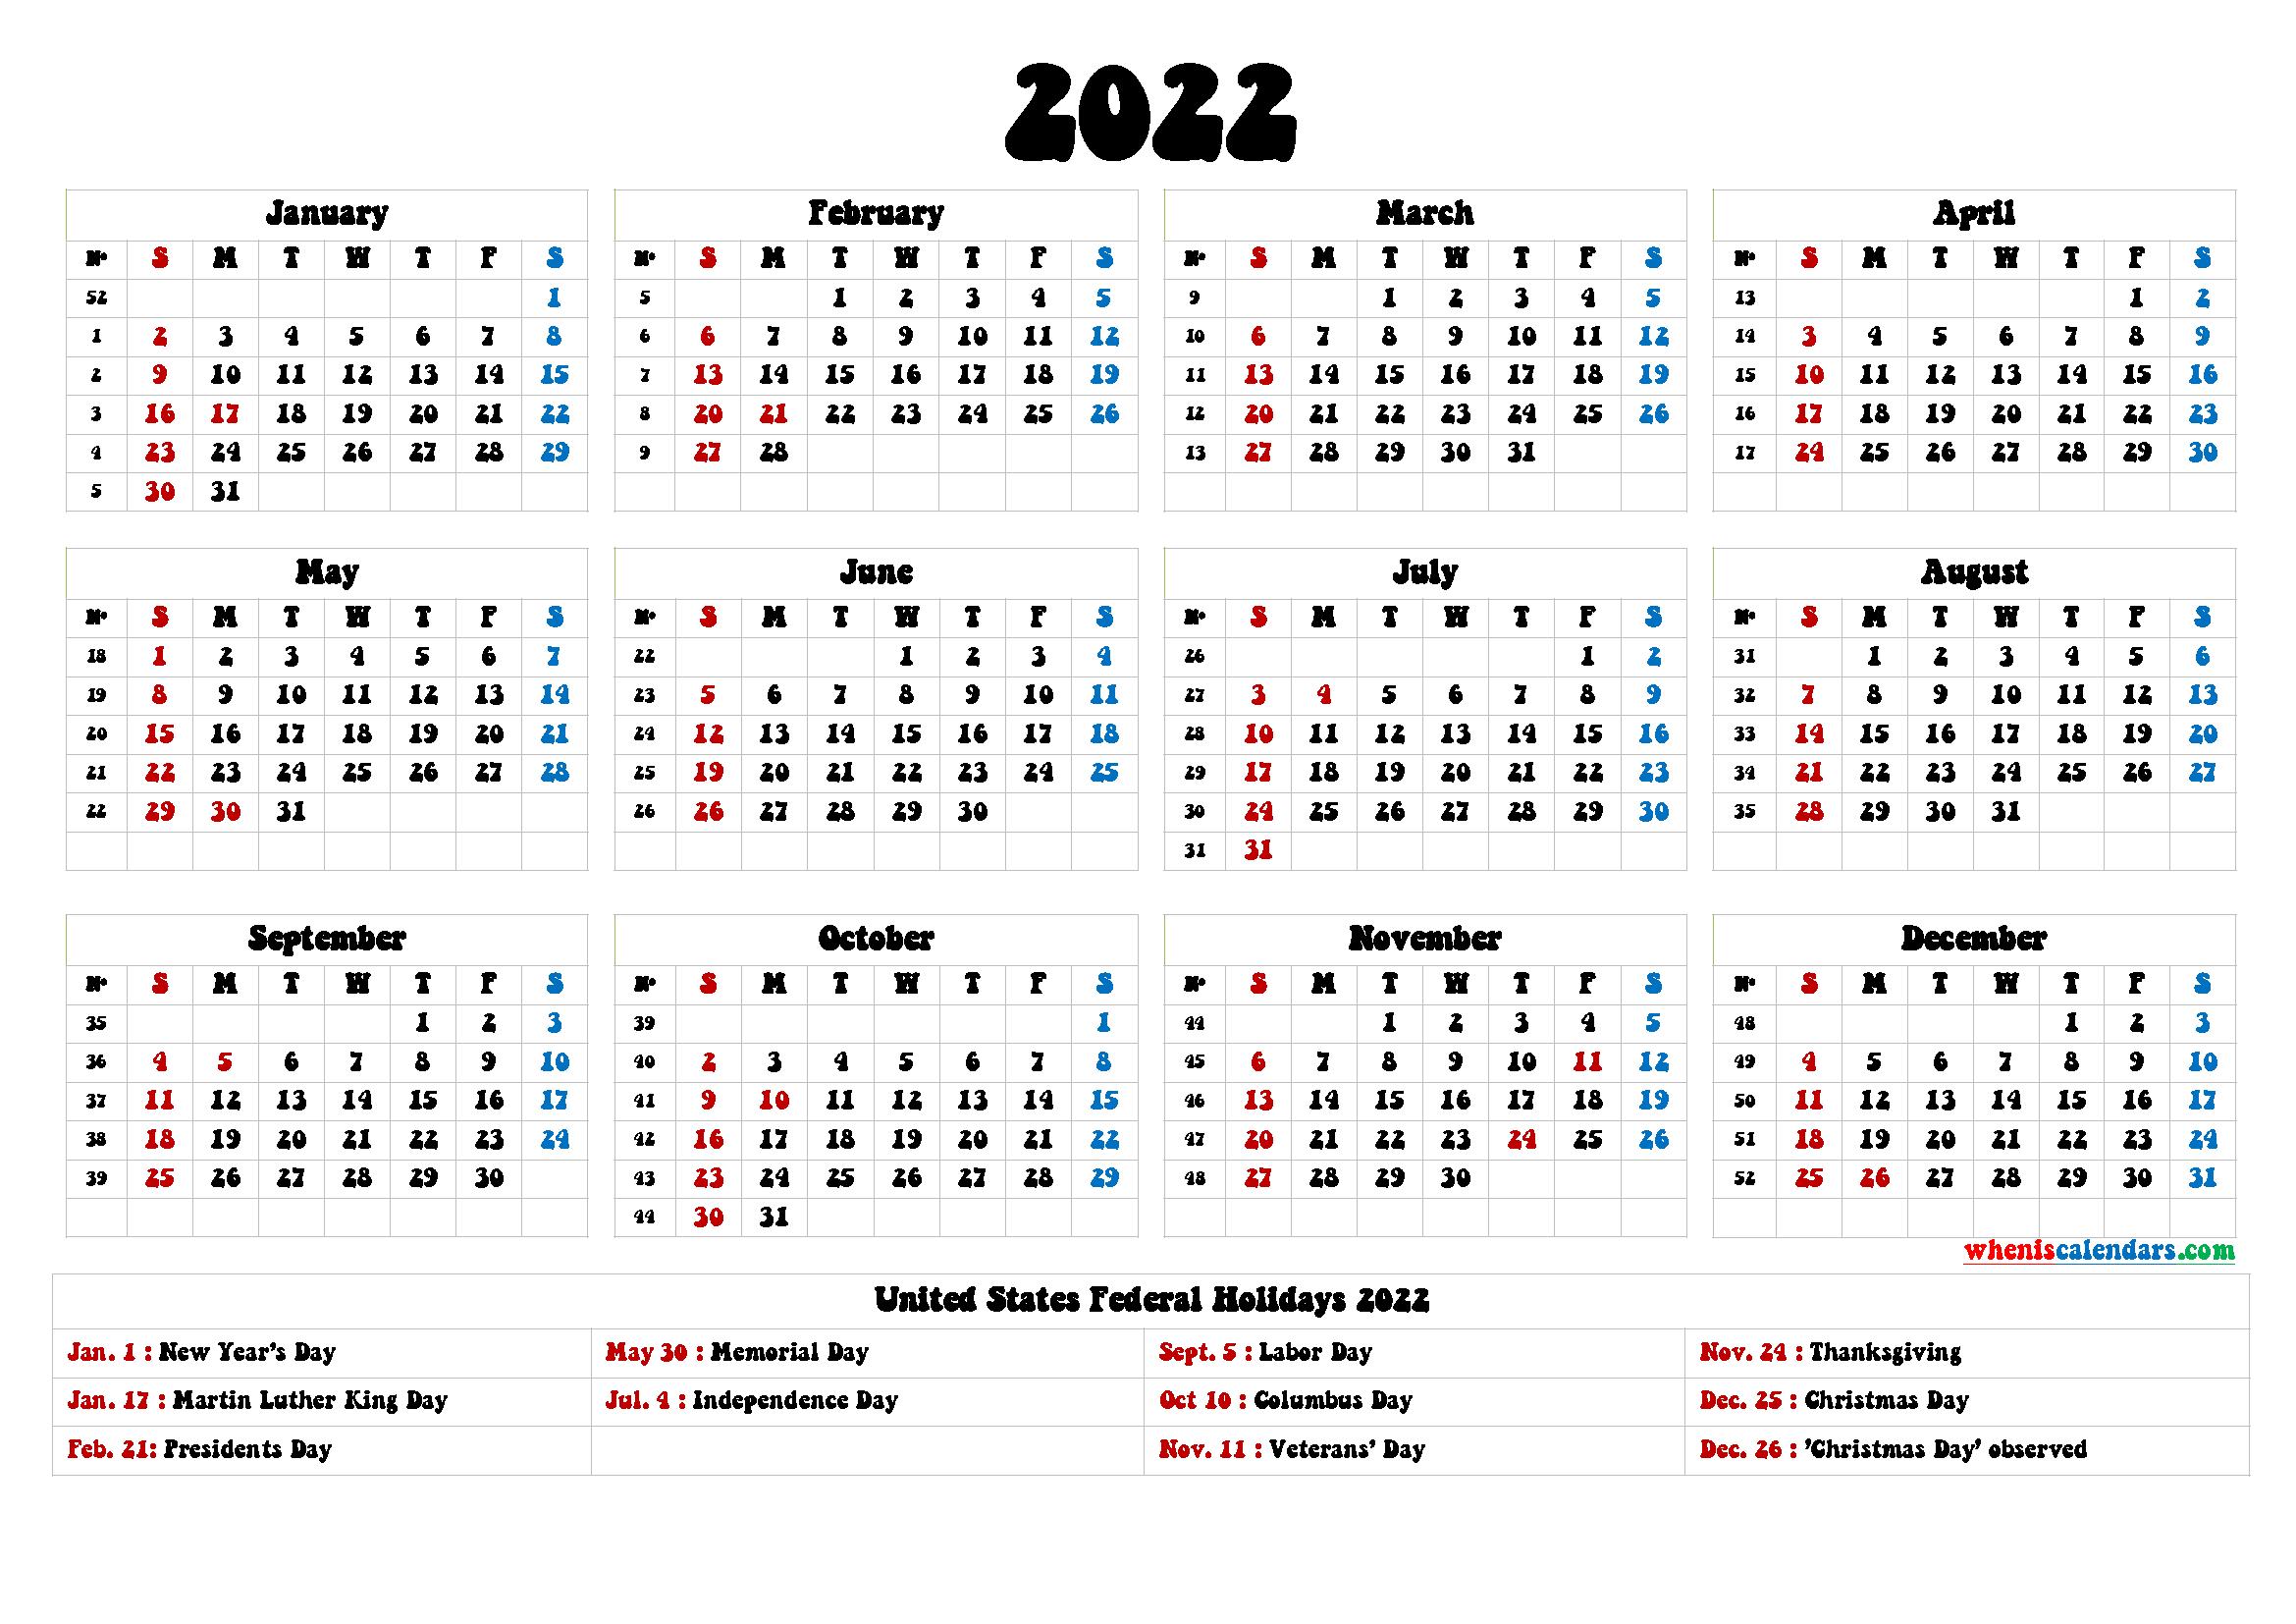 20+ Federal Holidays 2022 - Free Download Printable ...